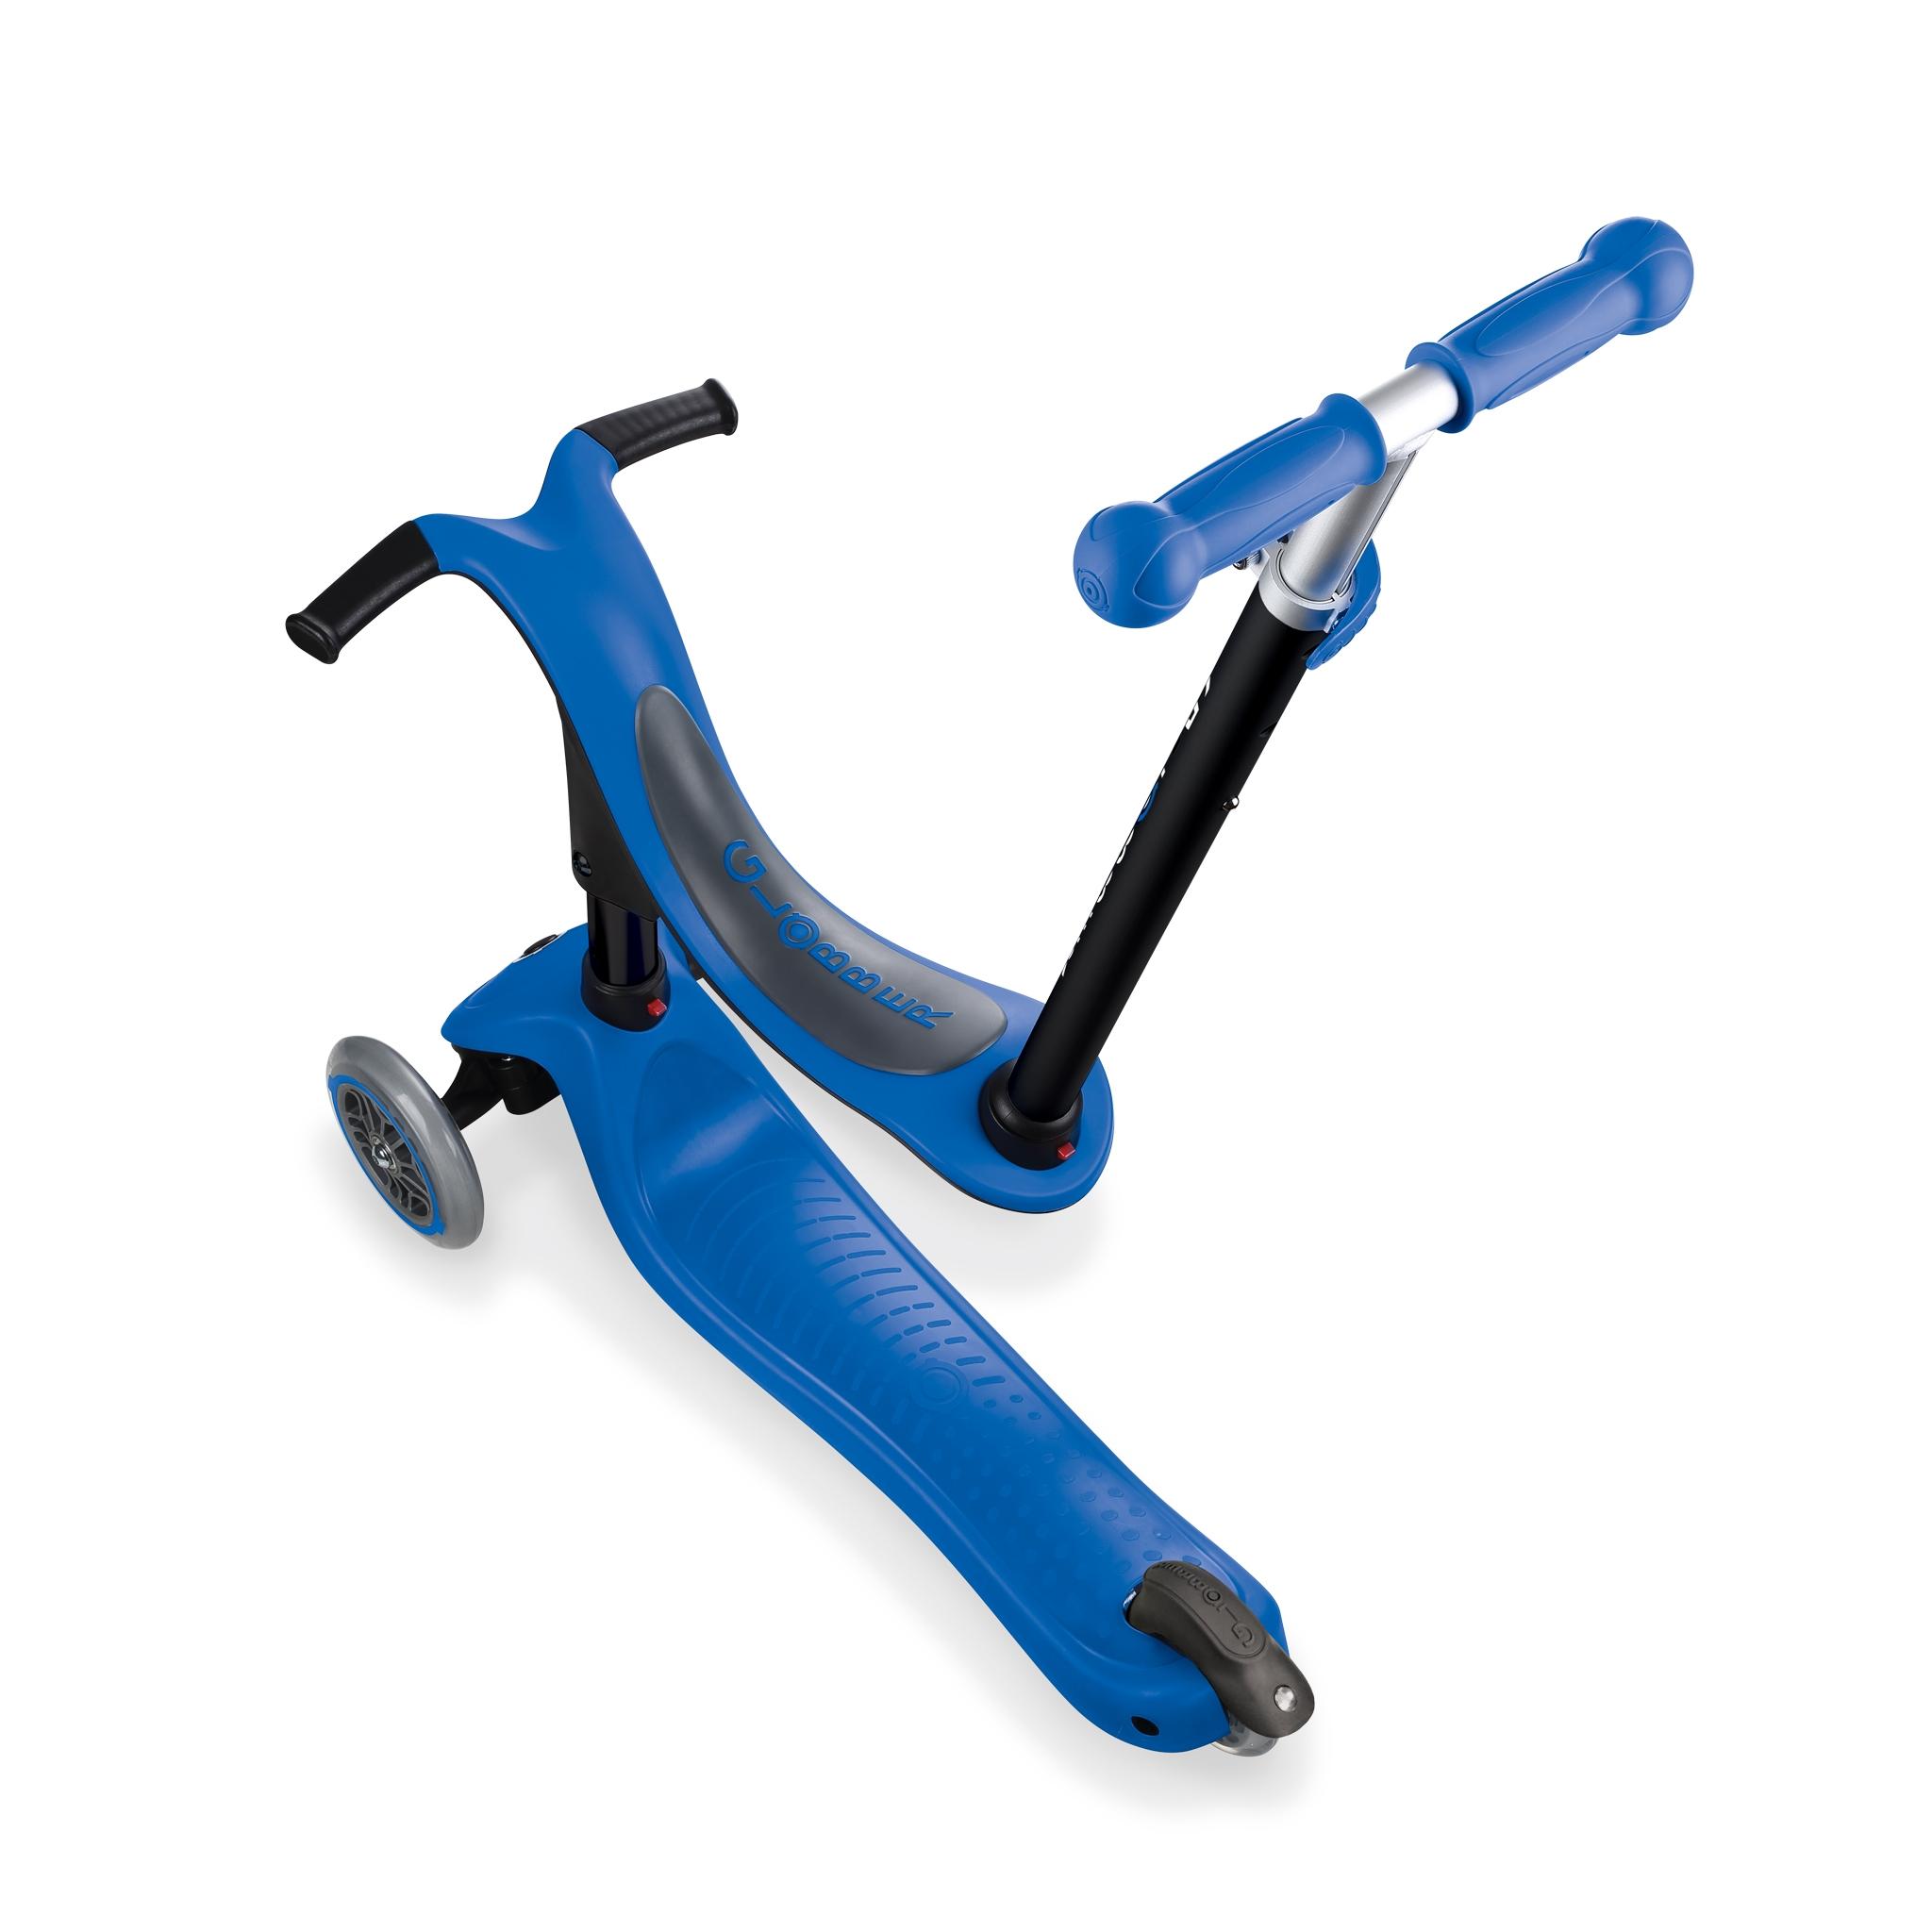 GO-UP-SPORTY-ride-on-walking-bike-scooter-screwless-design-navy-blue